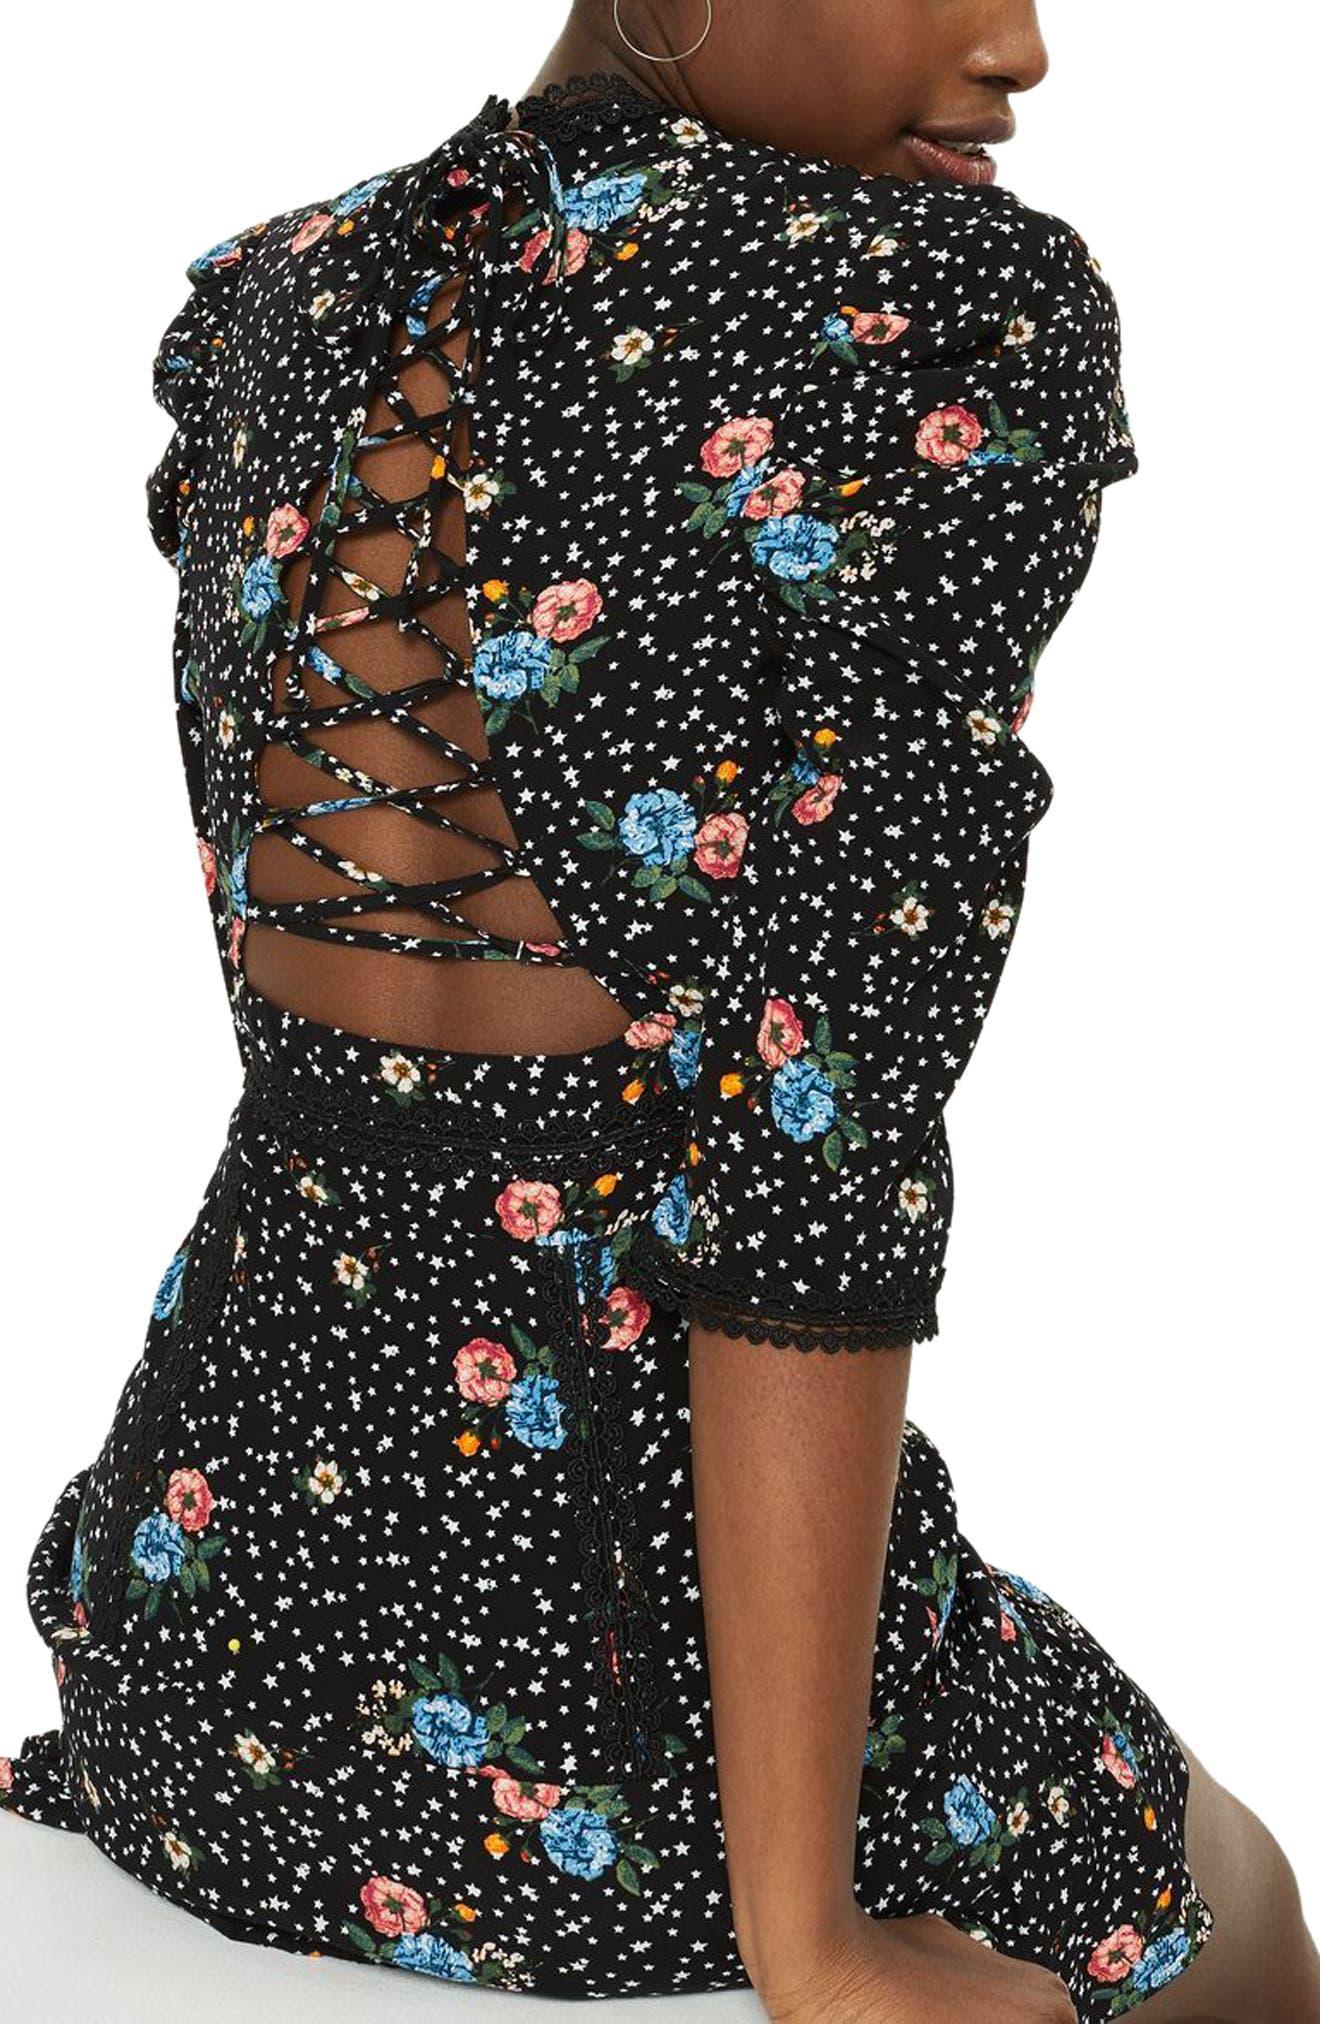 Lace-Up Back Floral Dress,                             Alternate thumbnail 2, color,                             001